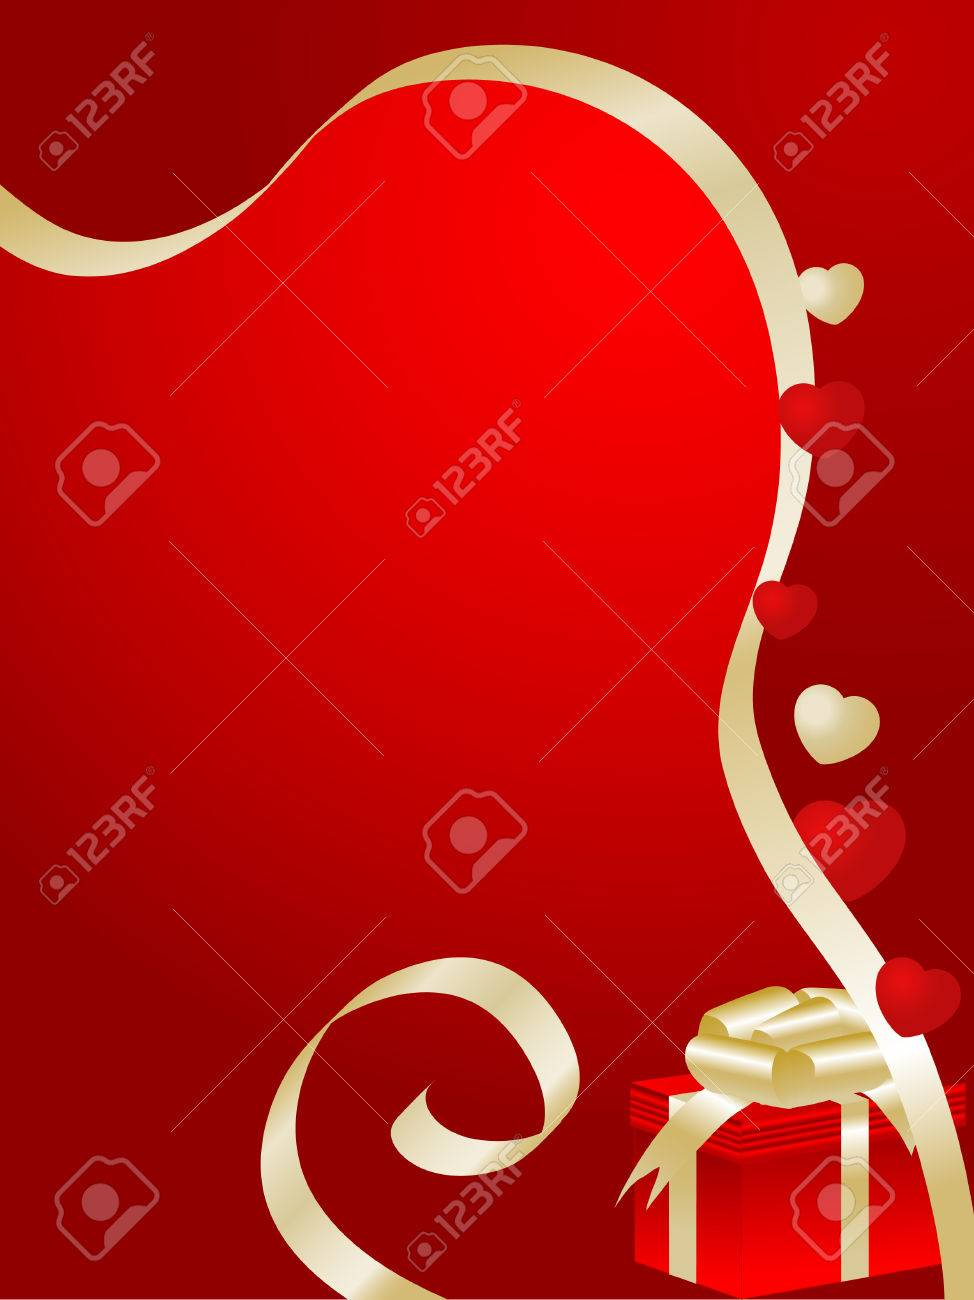 Valentine day background - vector illustration Stock Vector - 4214835